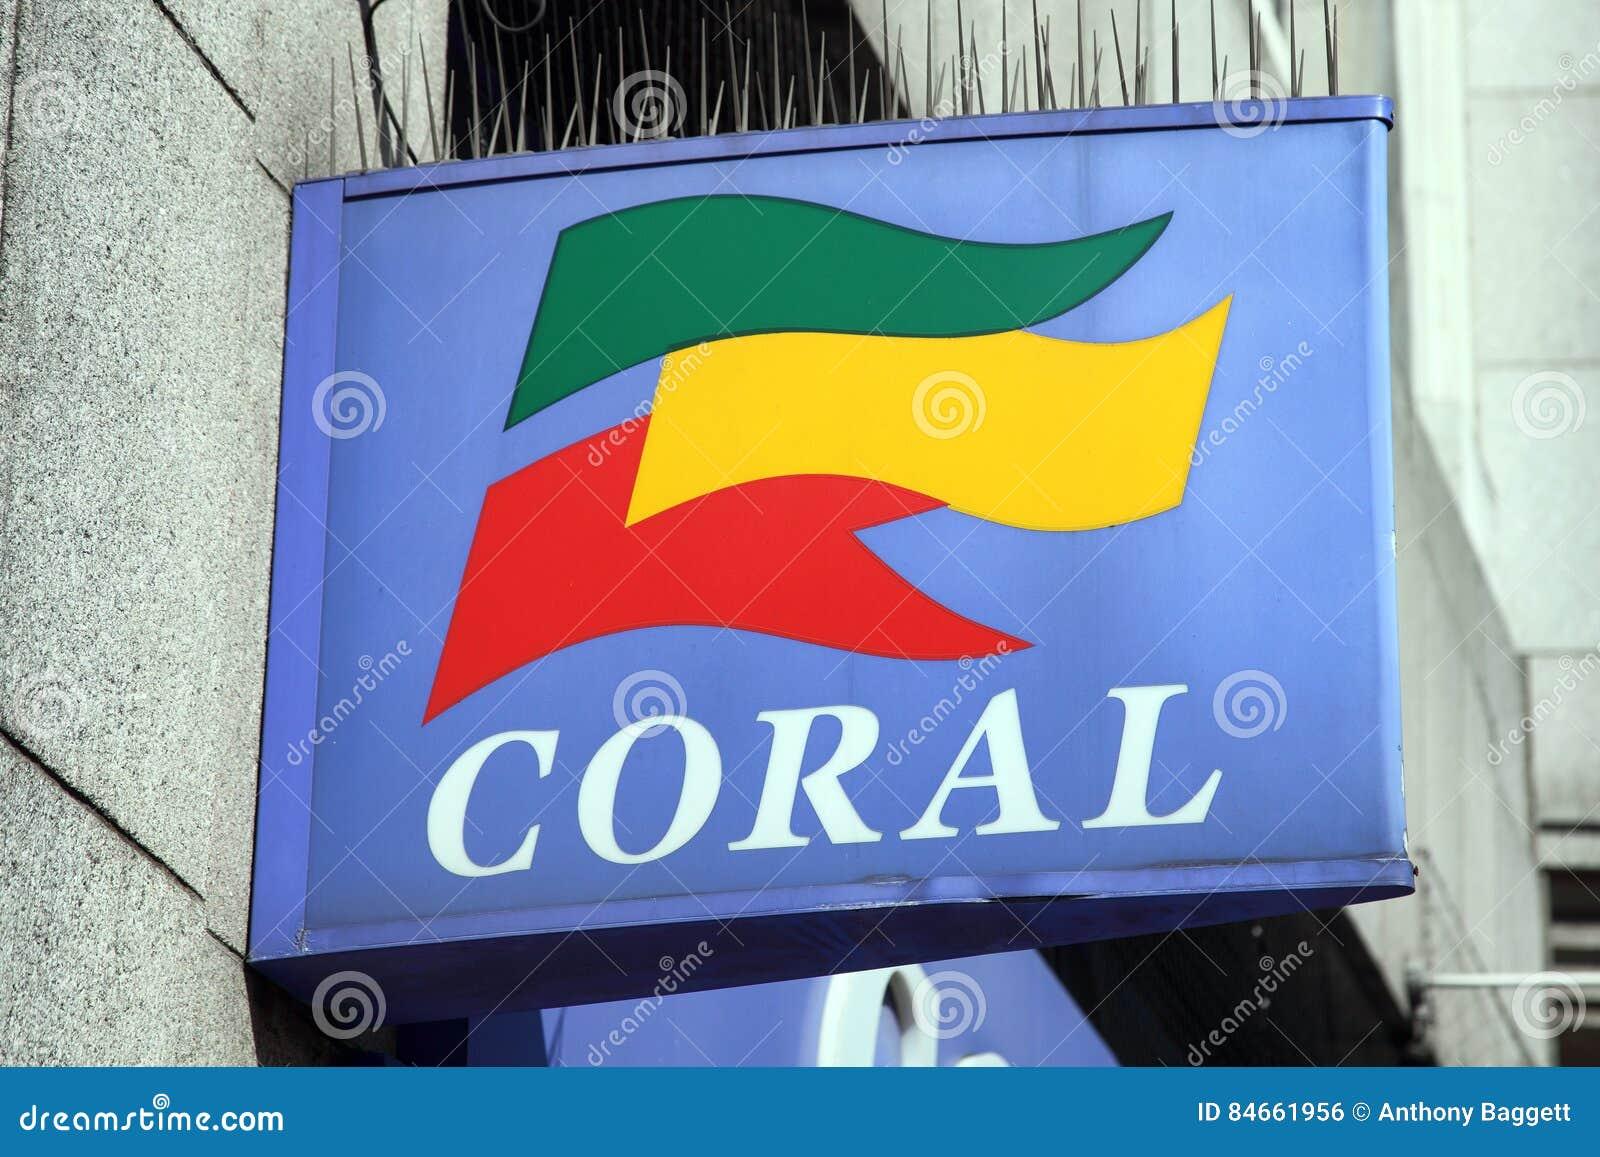 Corals bookmakers jobs betting shop alabama vs wisconsin betting line